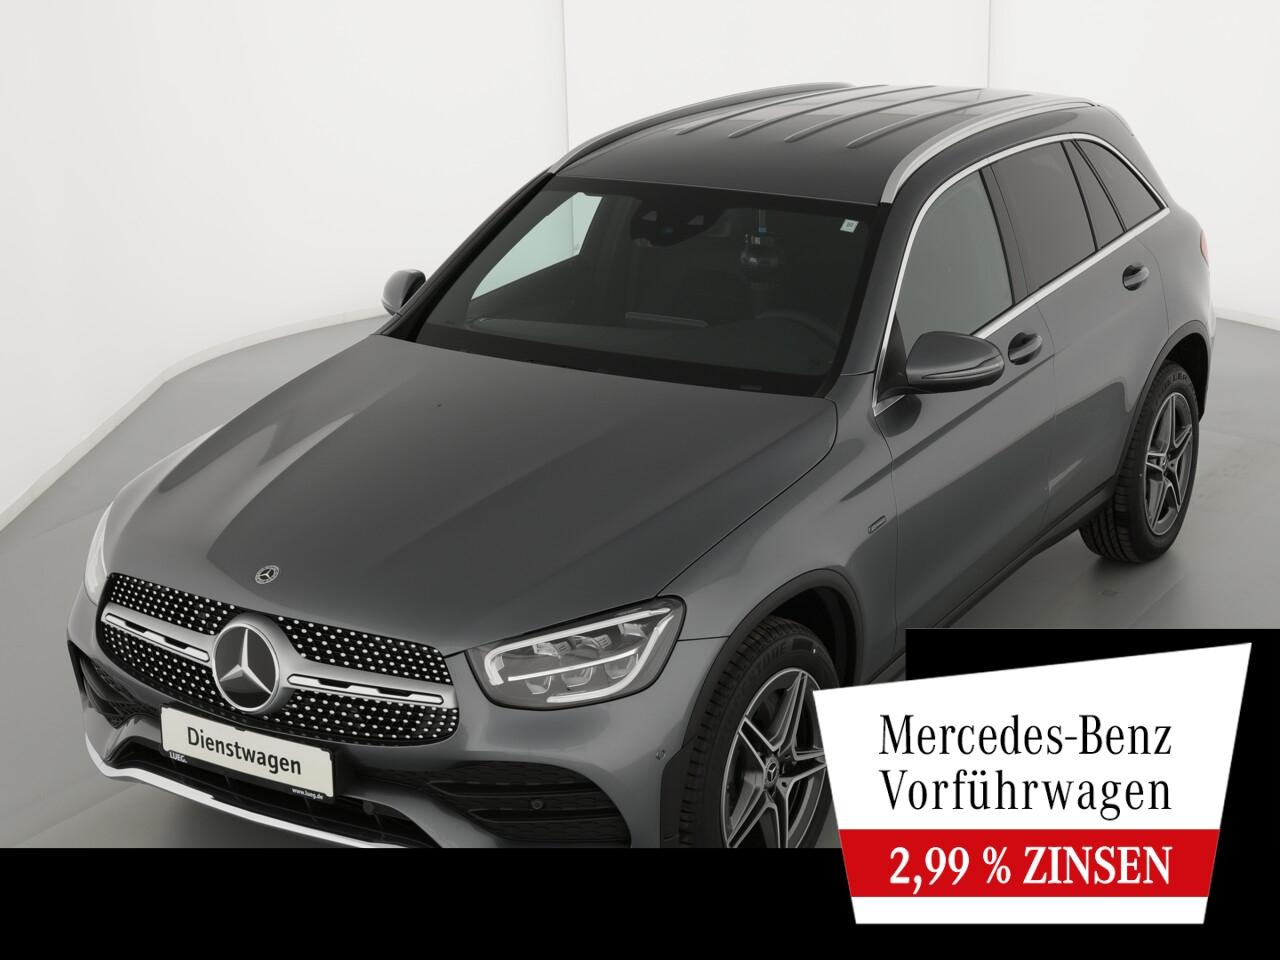 Mercedes-Benz GLC 300 de 4M AMG+FAHRASS+AHK+KAMERA+LED+PTS+SHZ, Jahr 2021, Hybrid_Diesel